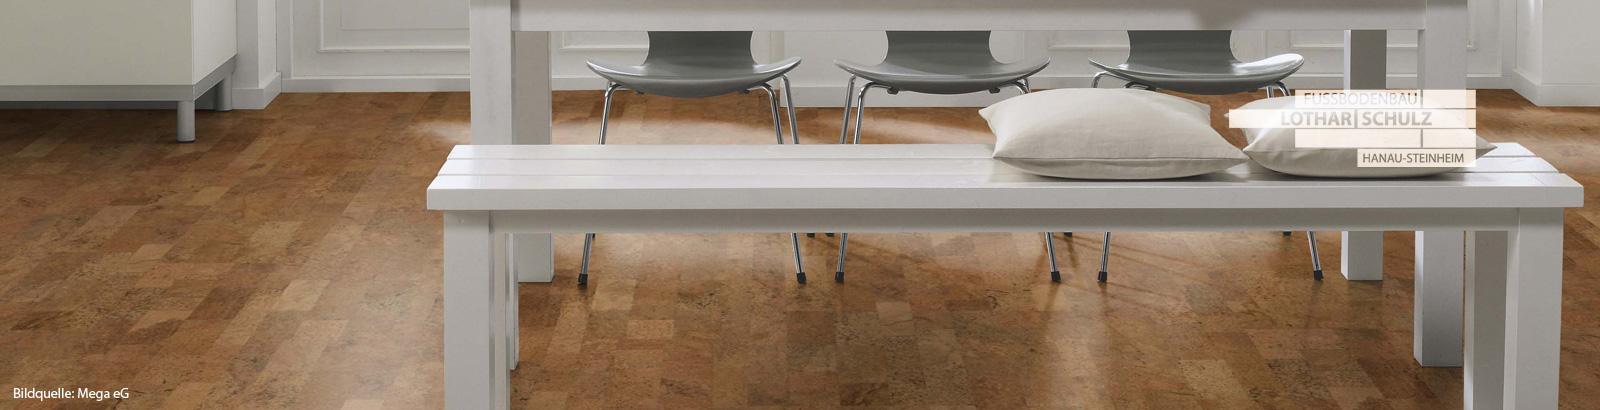 kork fussbodenbau lothar schulz legt ihnen diesen wunderbaren bodenbelag. Black Bedroom Furniture Sets. Home Design Ideas